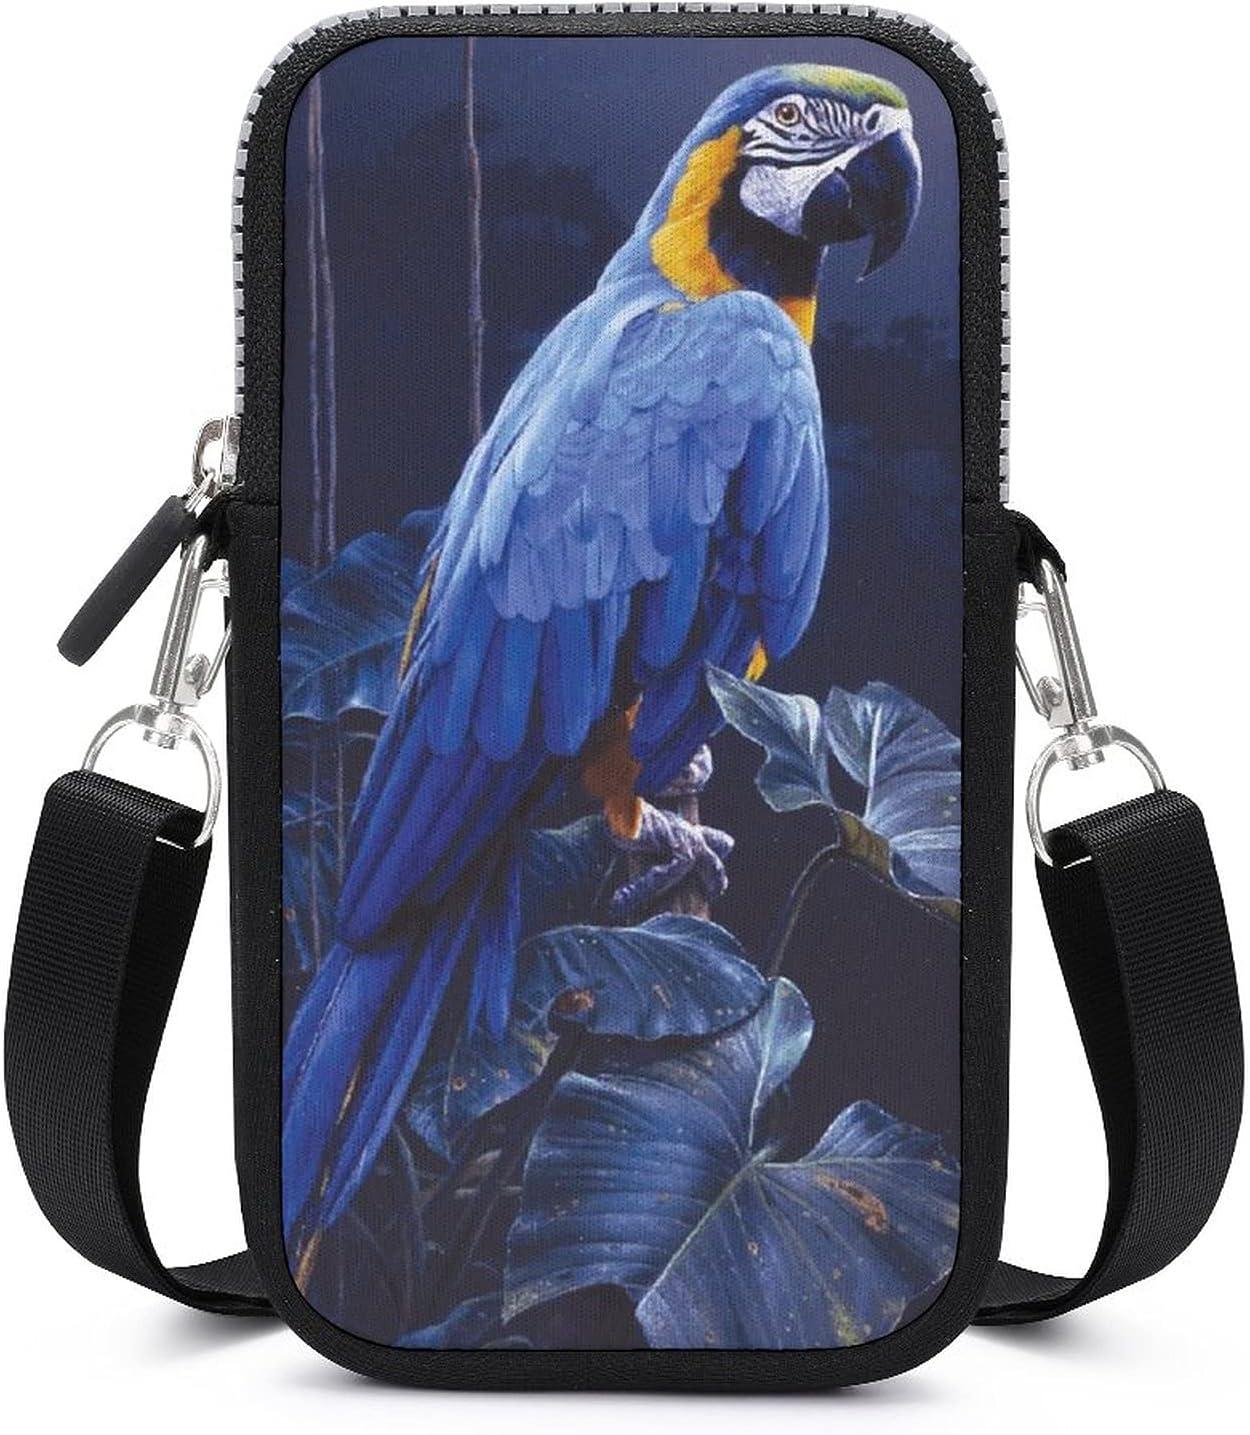 NiYoung Indefinitely Lovely Blue Parrot Rain Multipurpose Riding Handba Phone Bargain